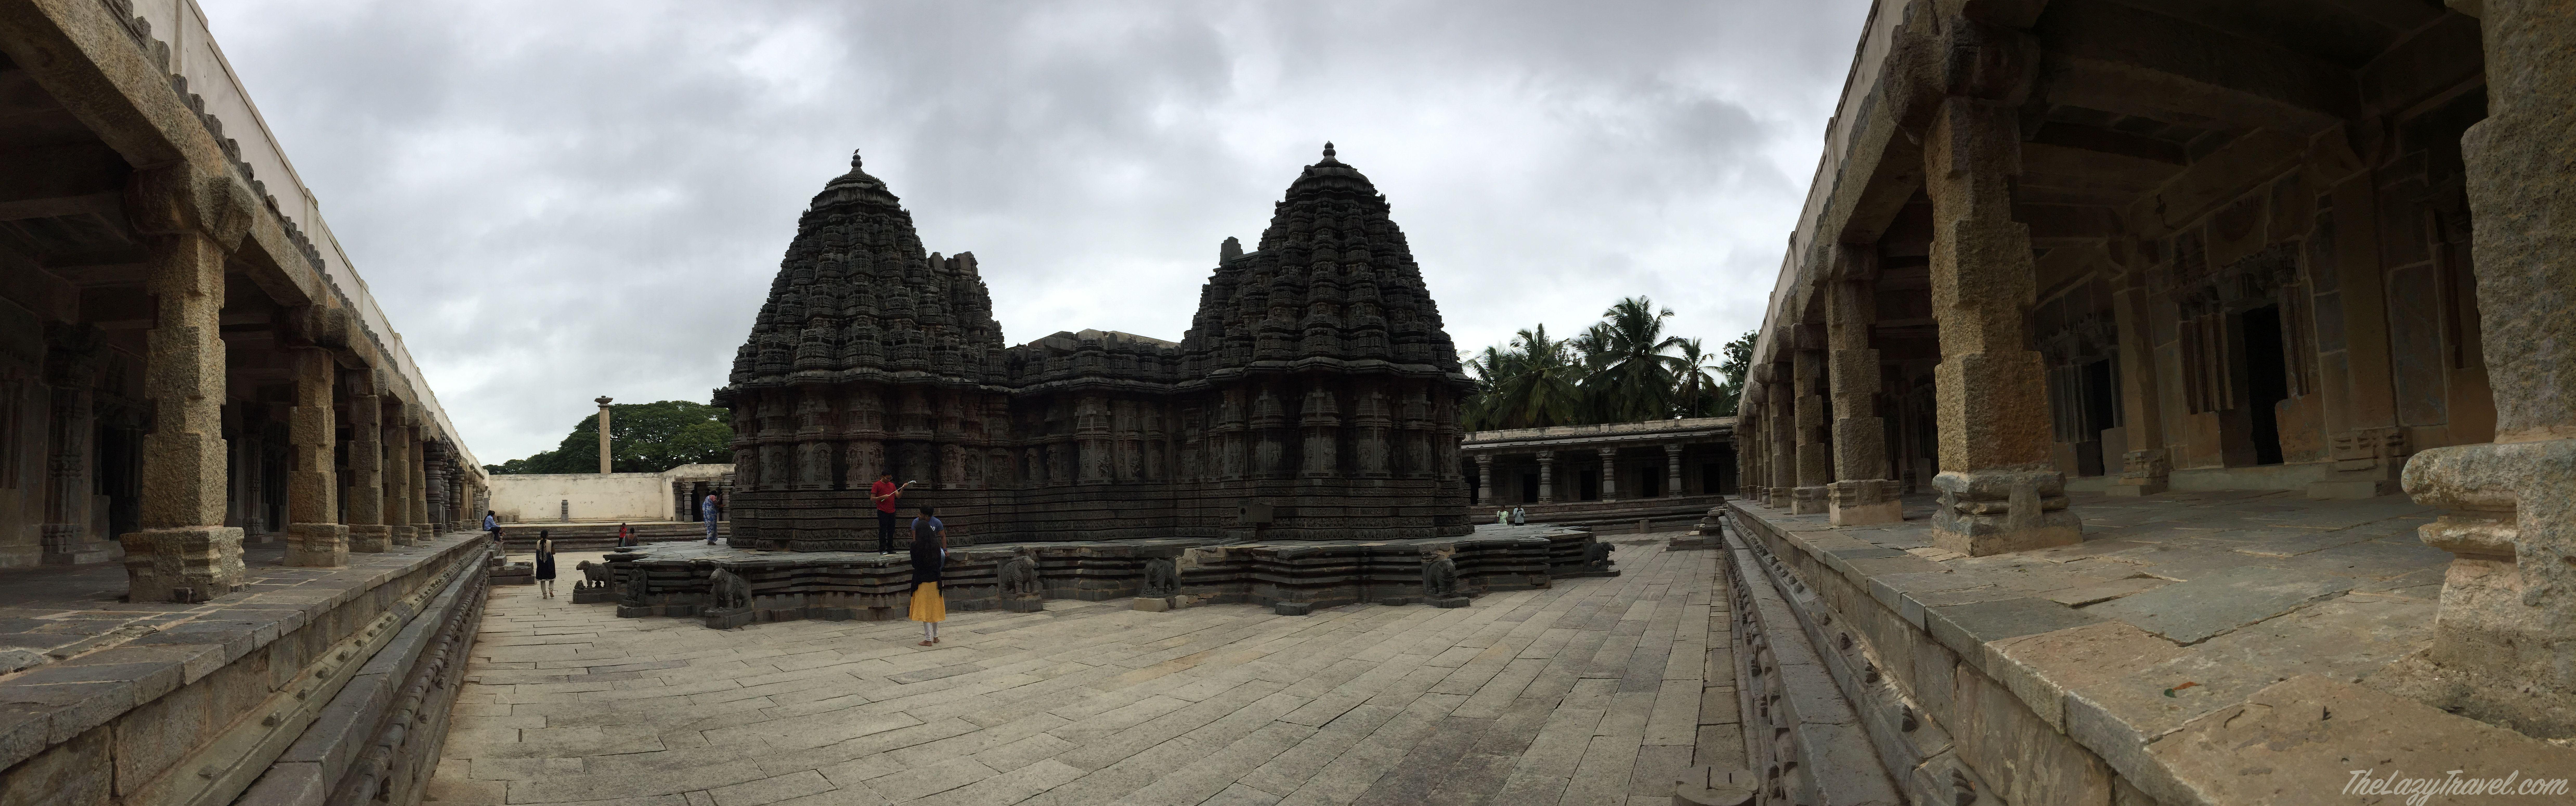 Chennakeshavatemple_Somnathpur 2